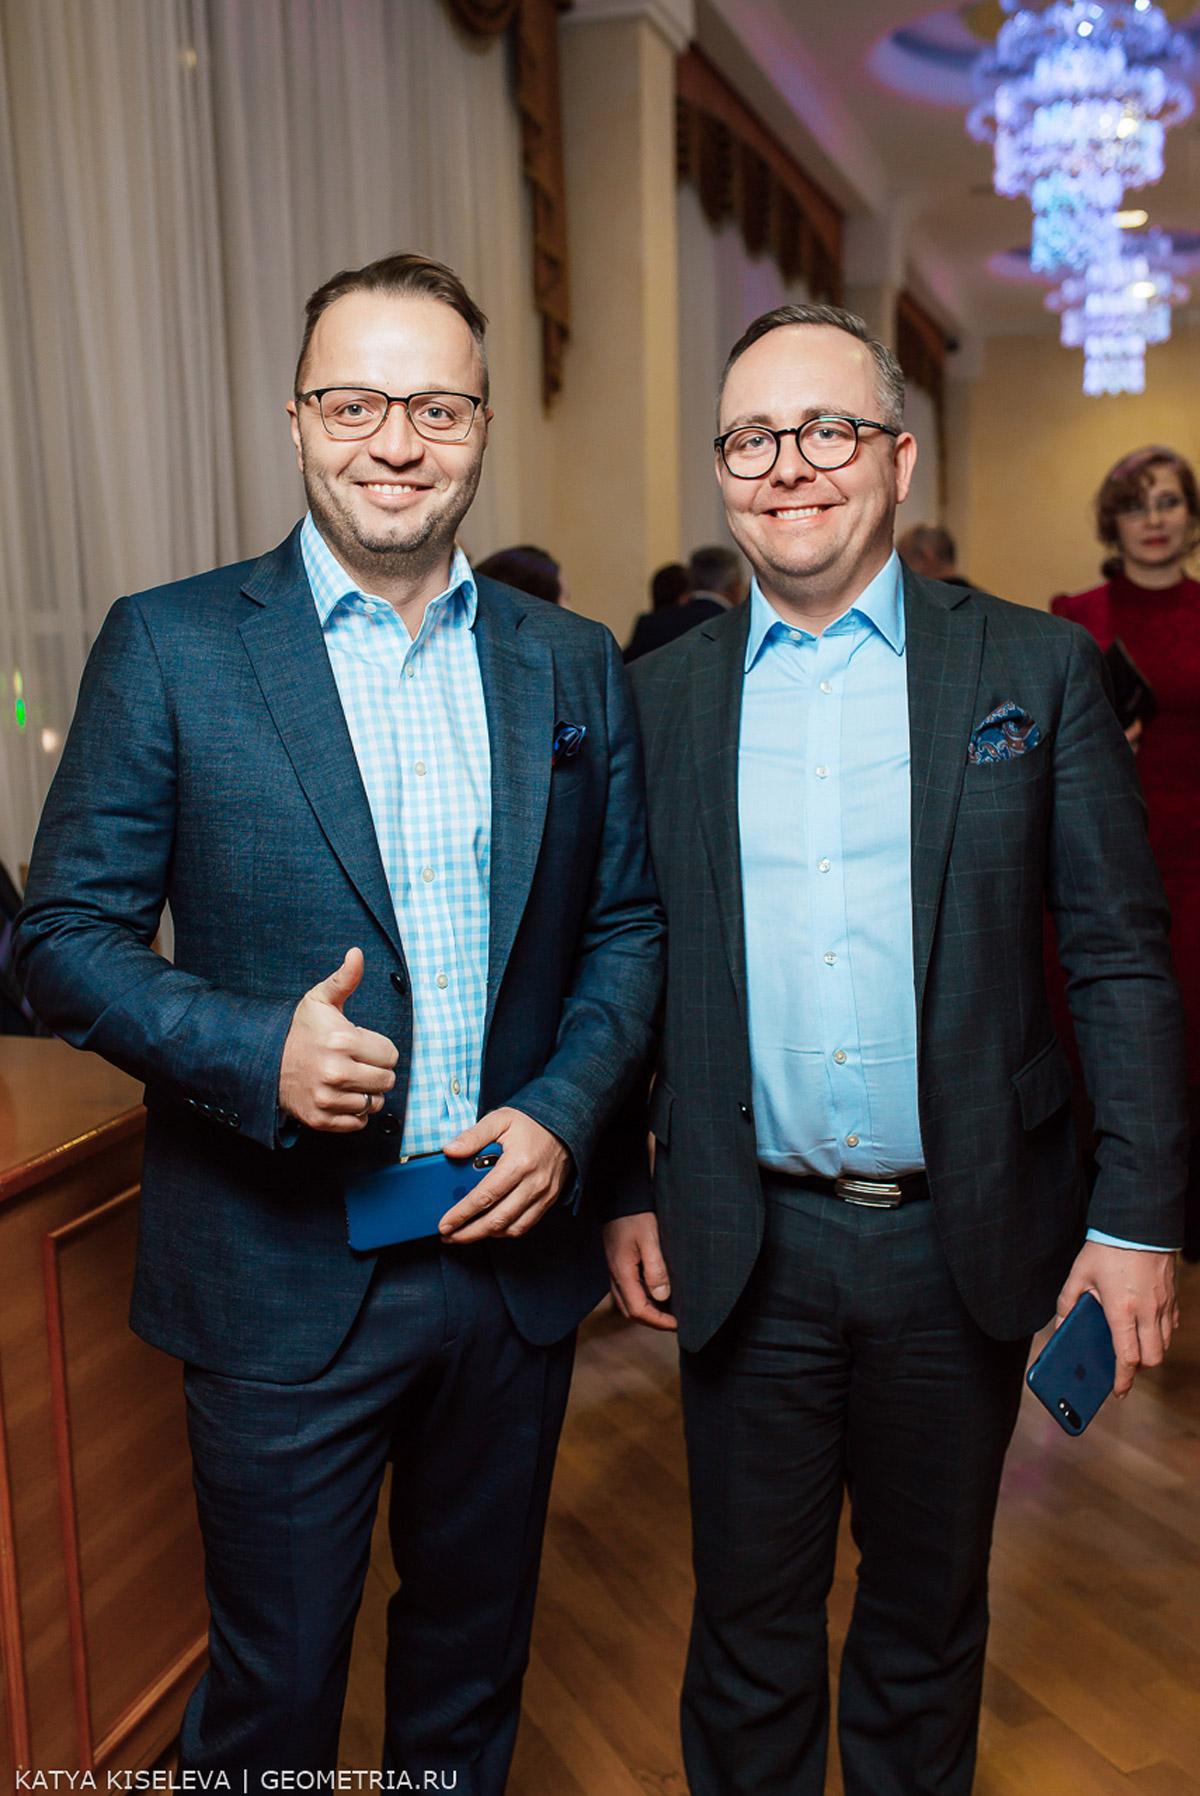 018_2018-02-14_19-03-51_Kiseleva.jpg